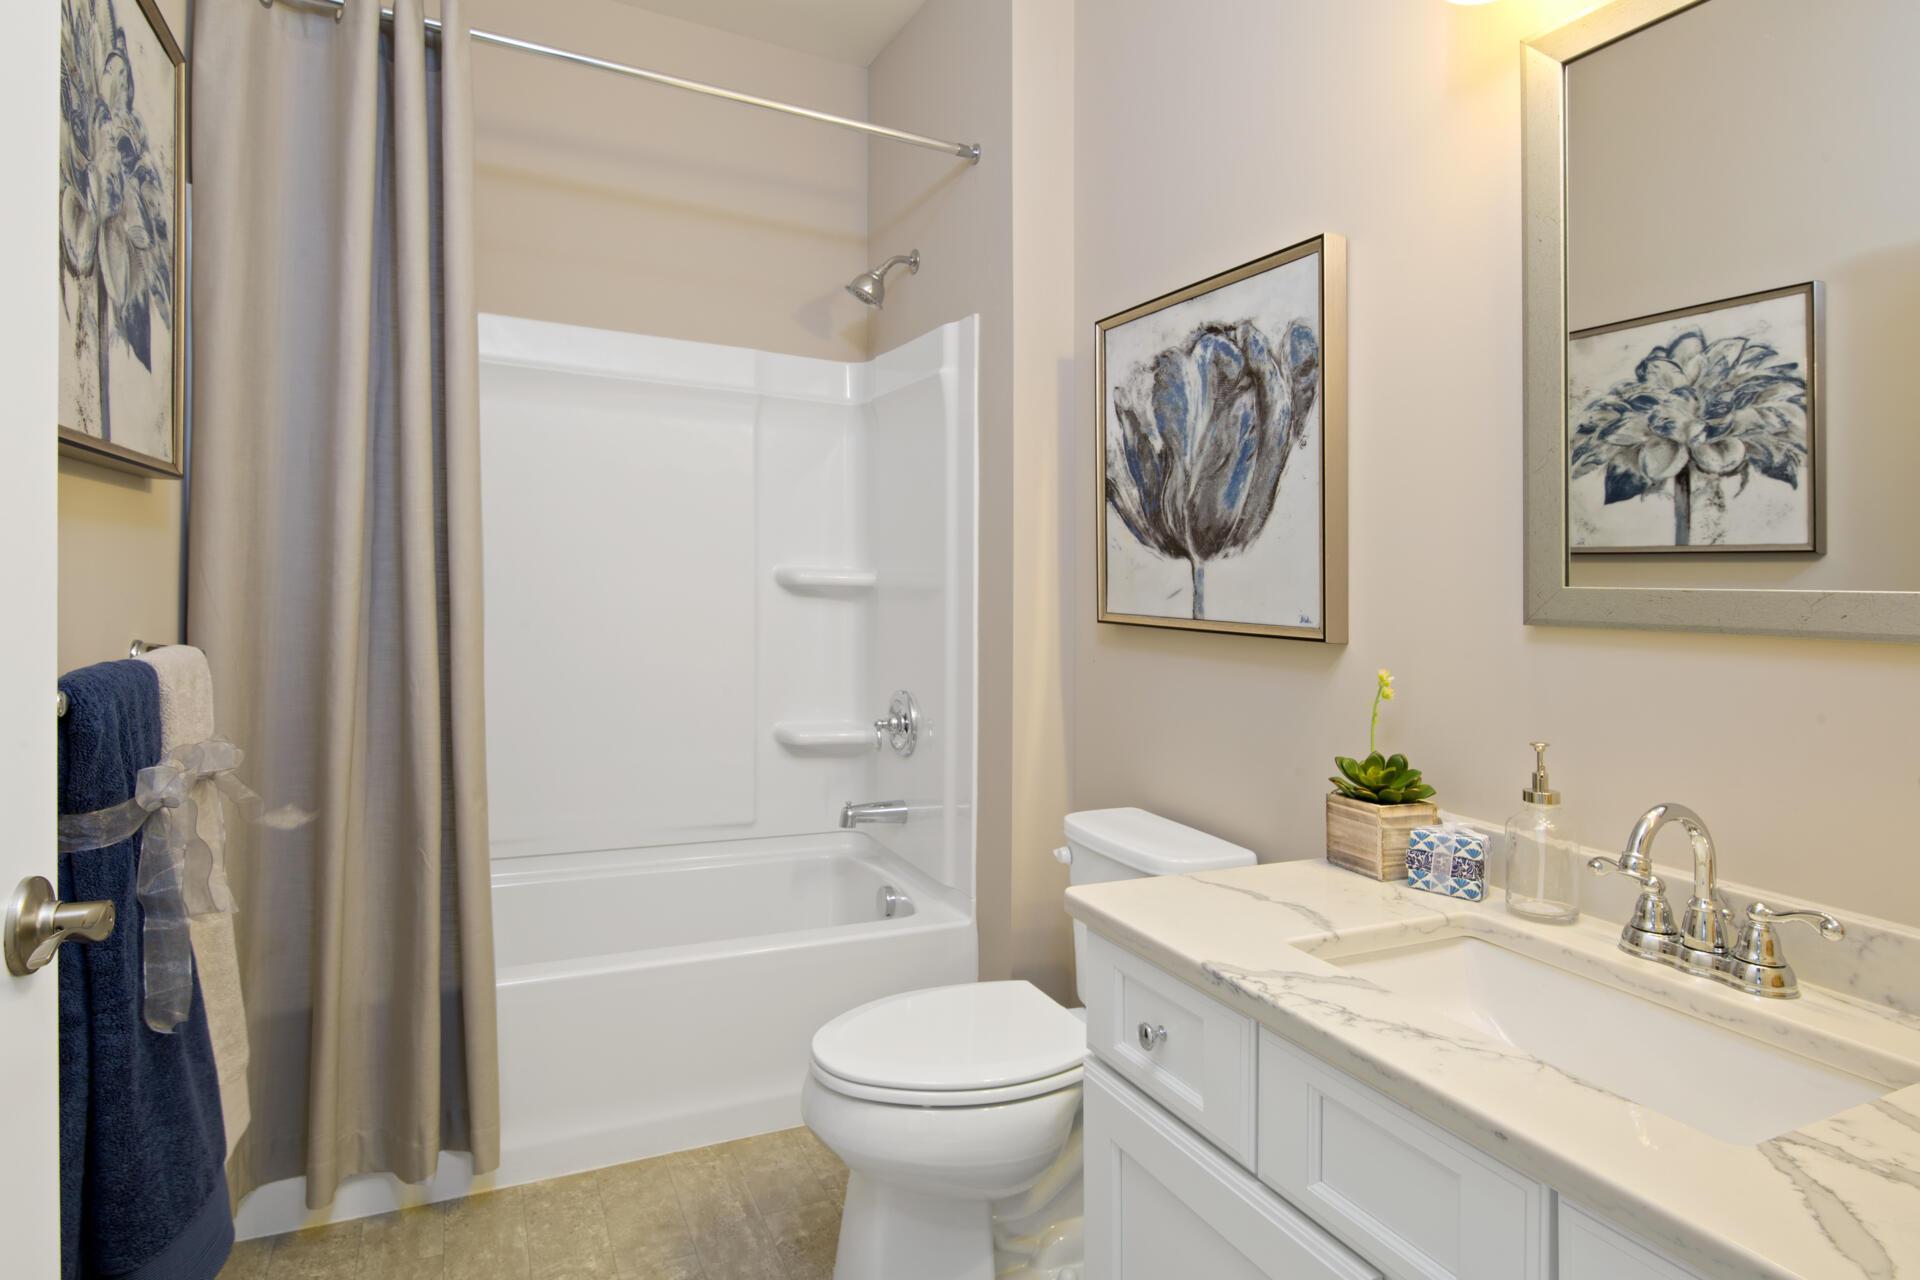 Bathroom featured in the Clearwater By Drees Homes in Cincinnati, KY